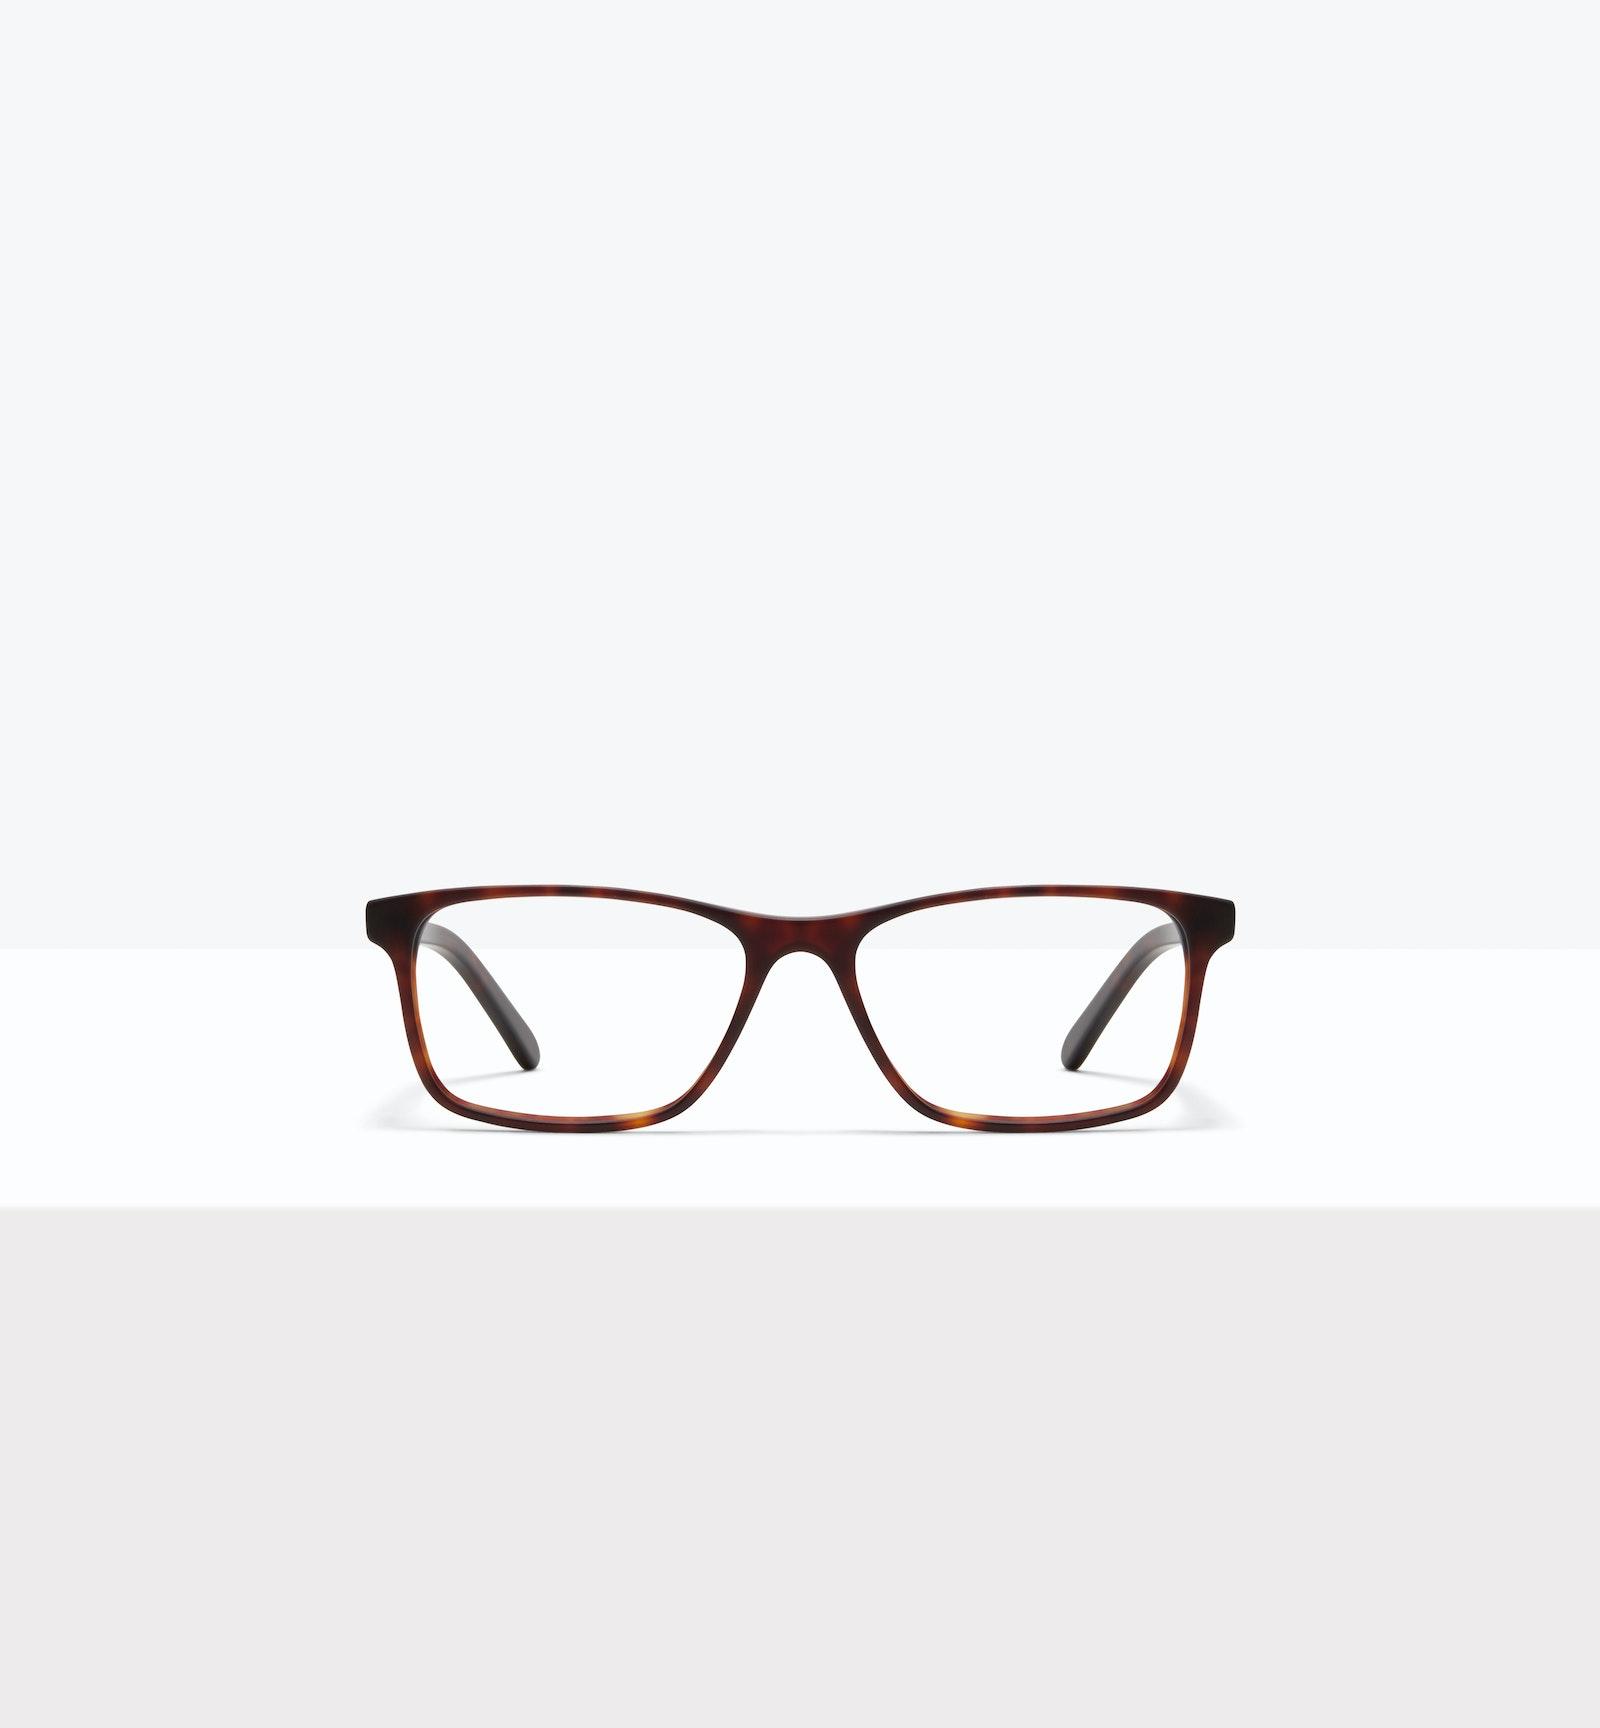 Affordable Fashion Glasses Rectangle Eyeglasses Men Henri XL Matte Tort